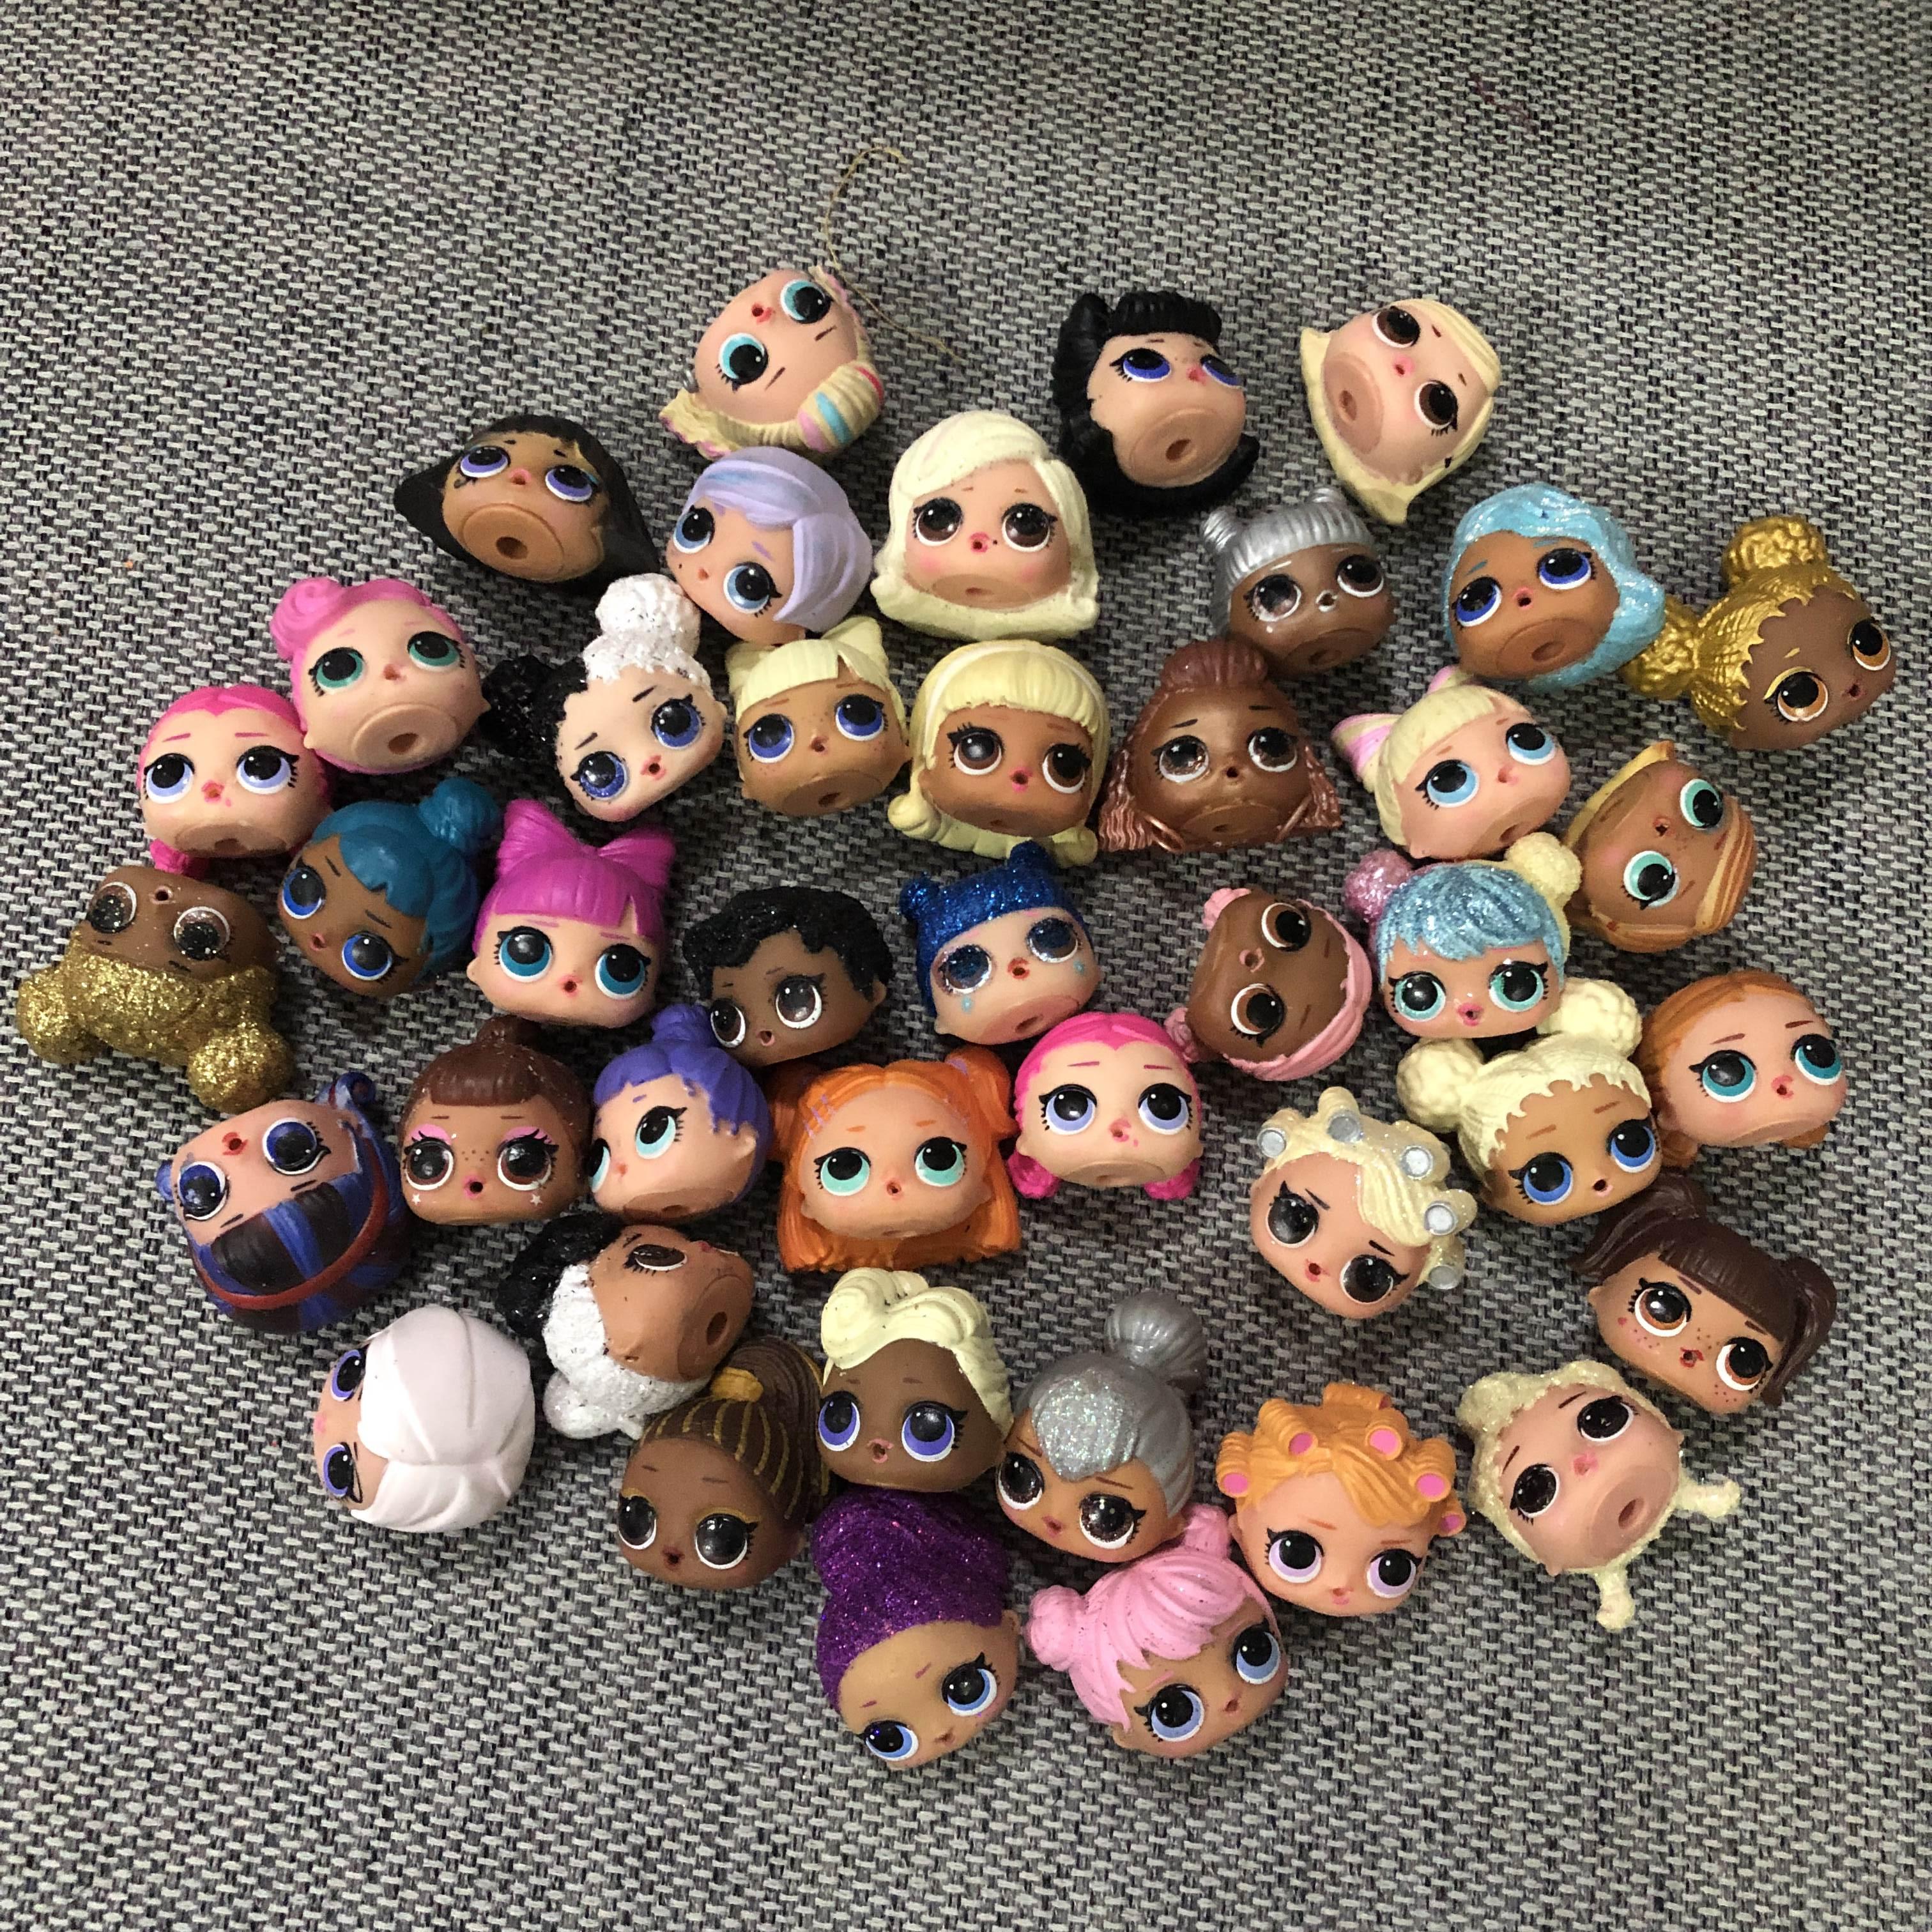 LOL Doll Surprise Original  Head Dolls Action Figure Model Girl Christmas Gift Toys For Chilren